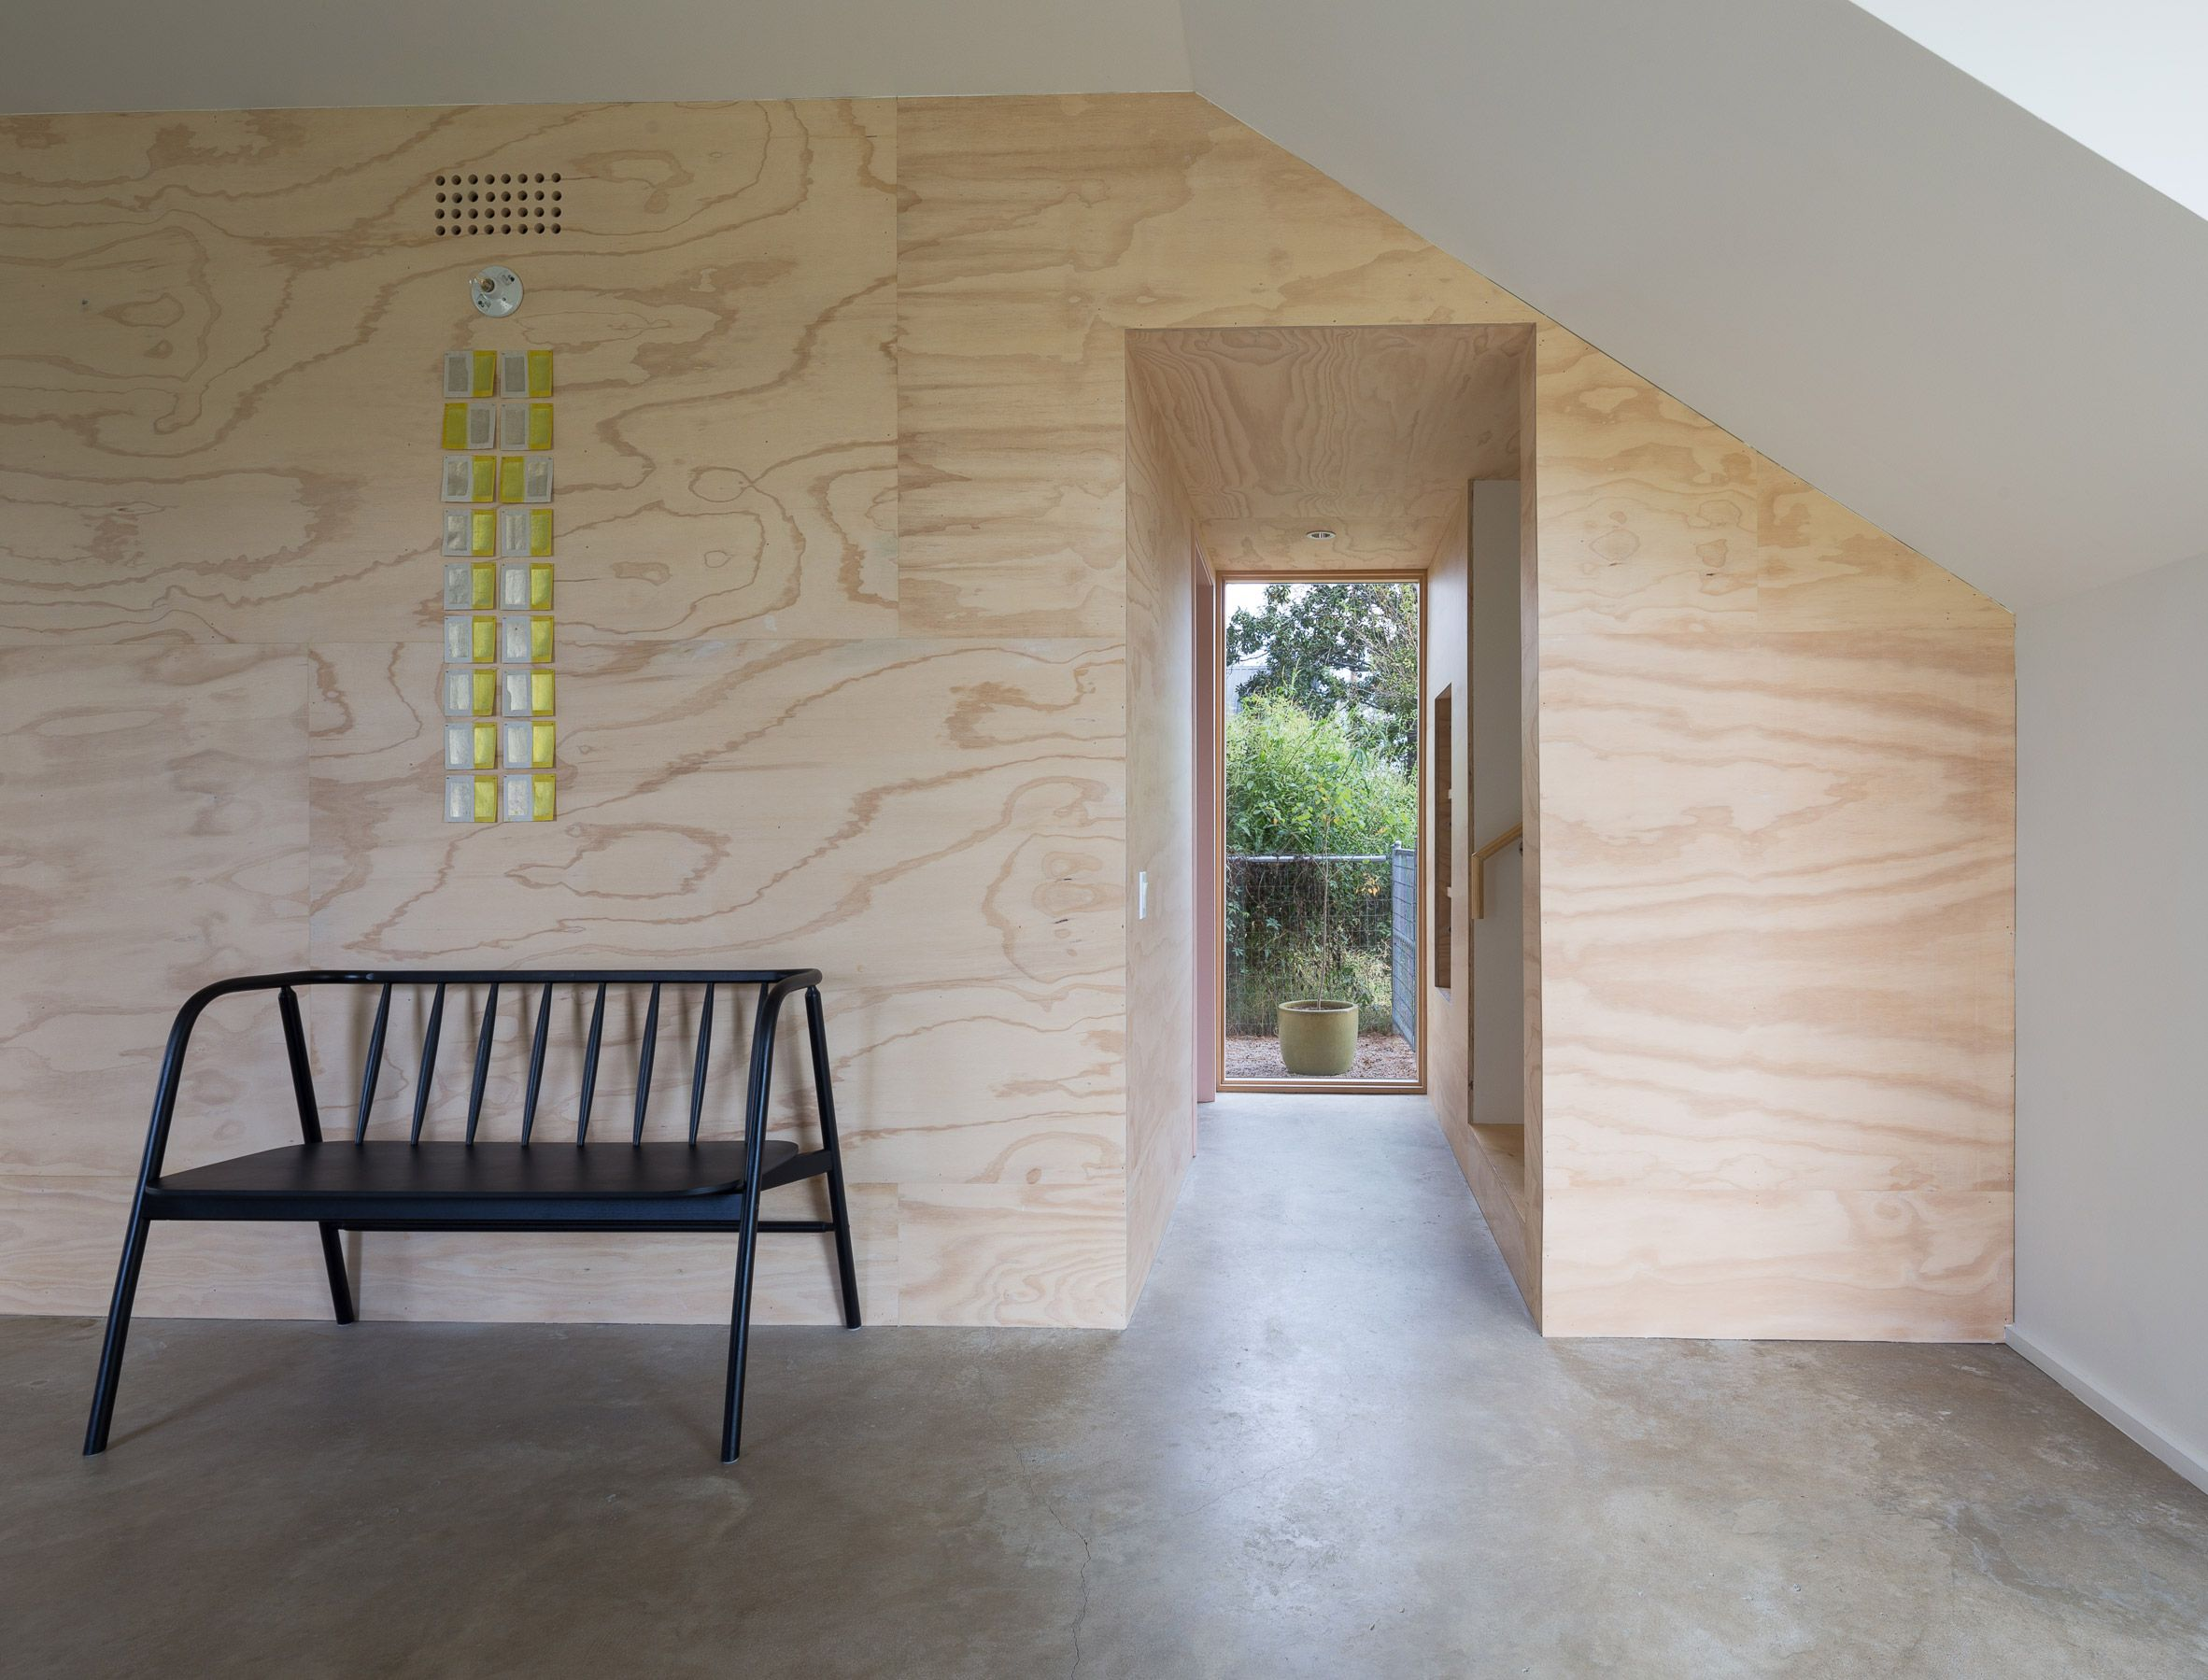 Self built Austin home by Sean Guess is